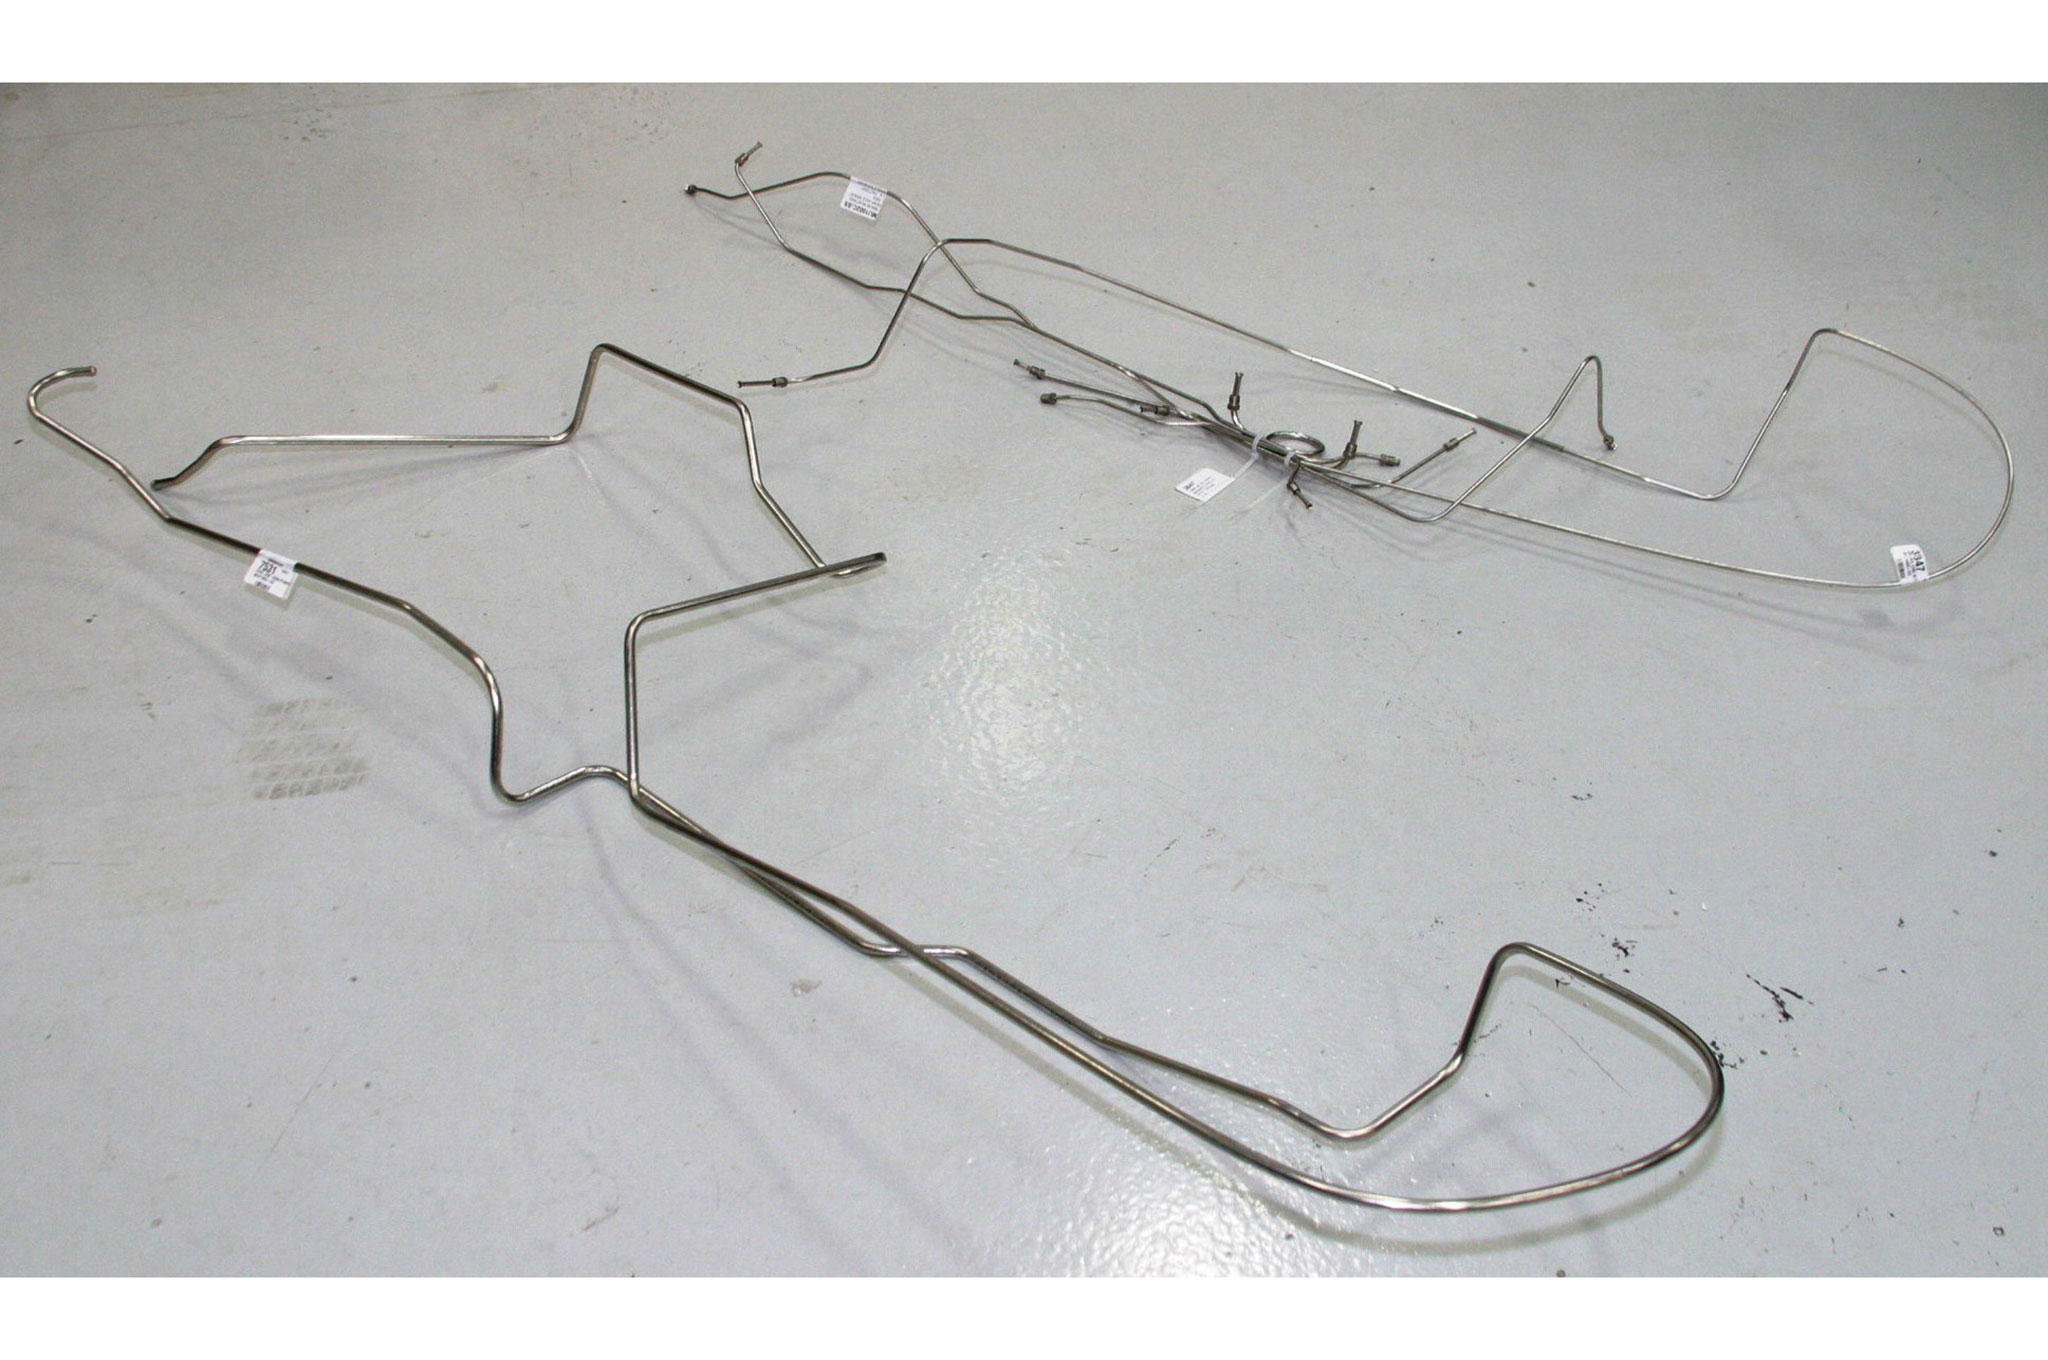 Brake Fuel Lines